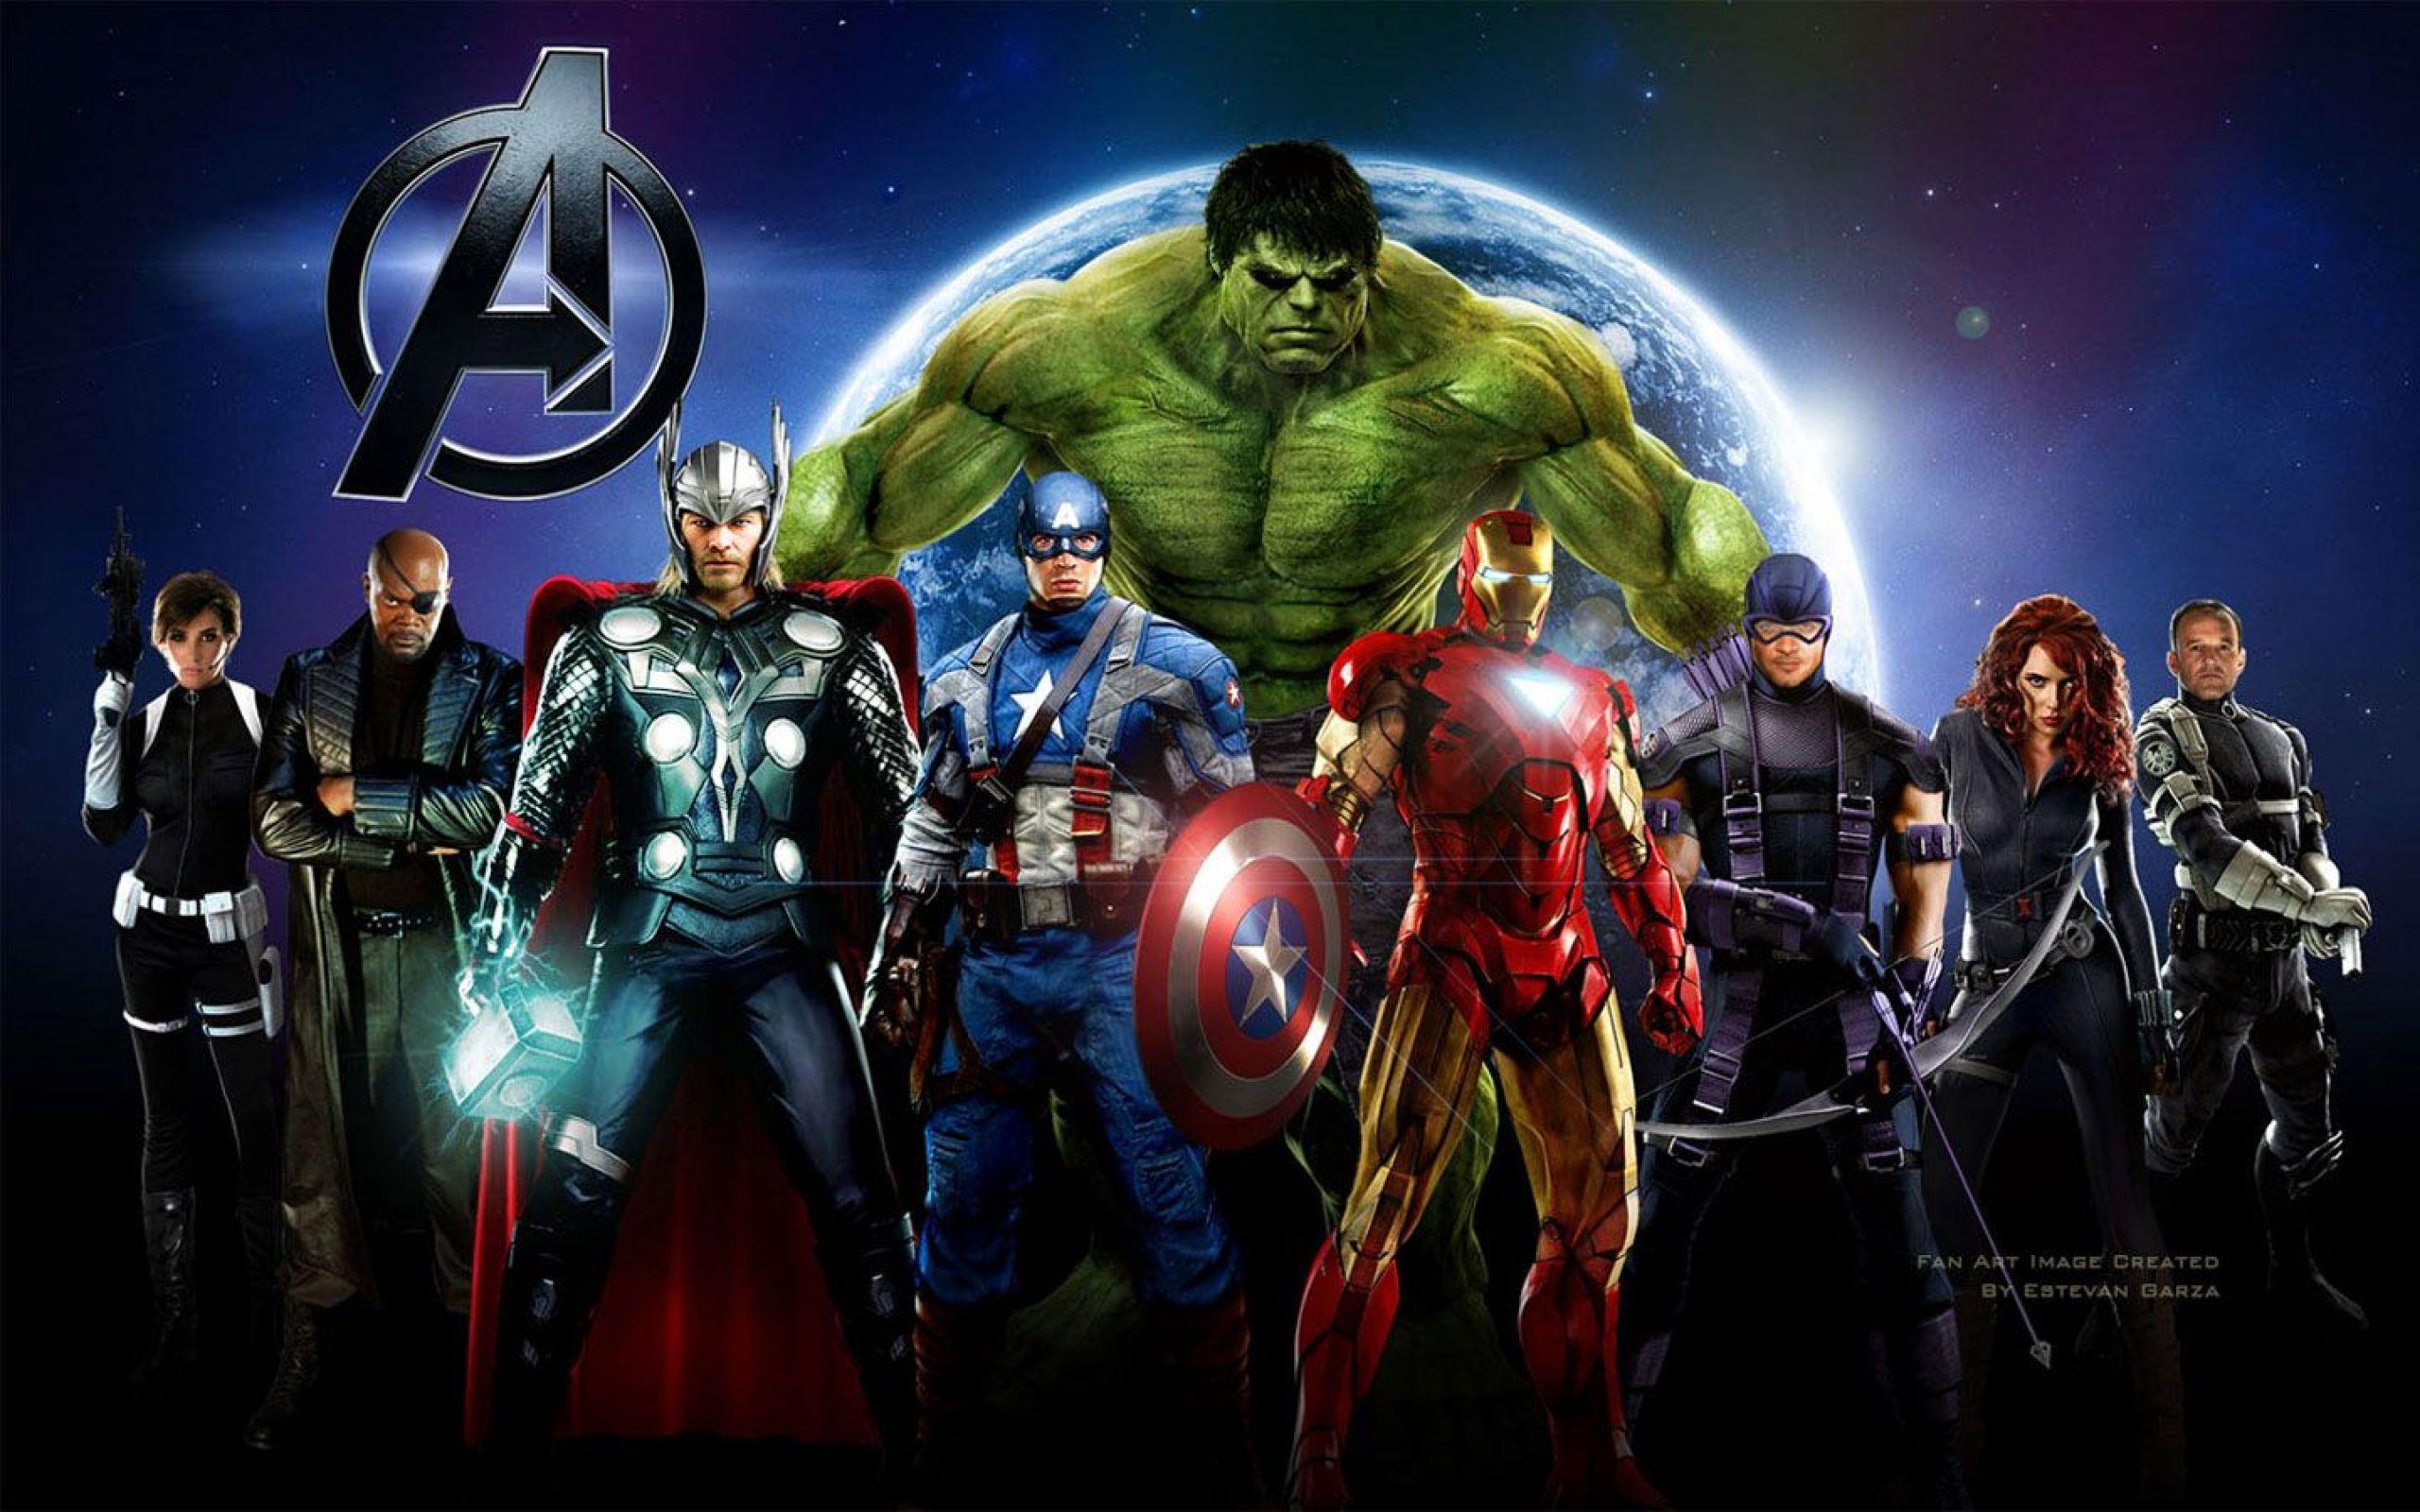 Avenger Wallpapers Full HD Wide Screen Wallpaper 1080p2K4K 2560x1600